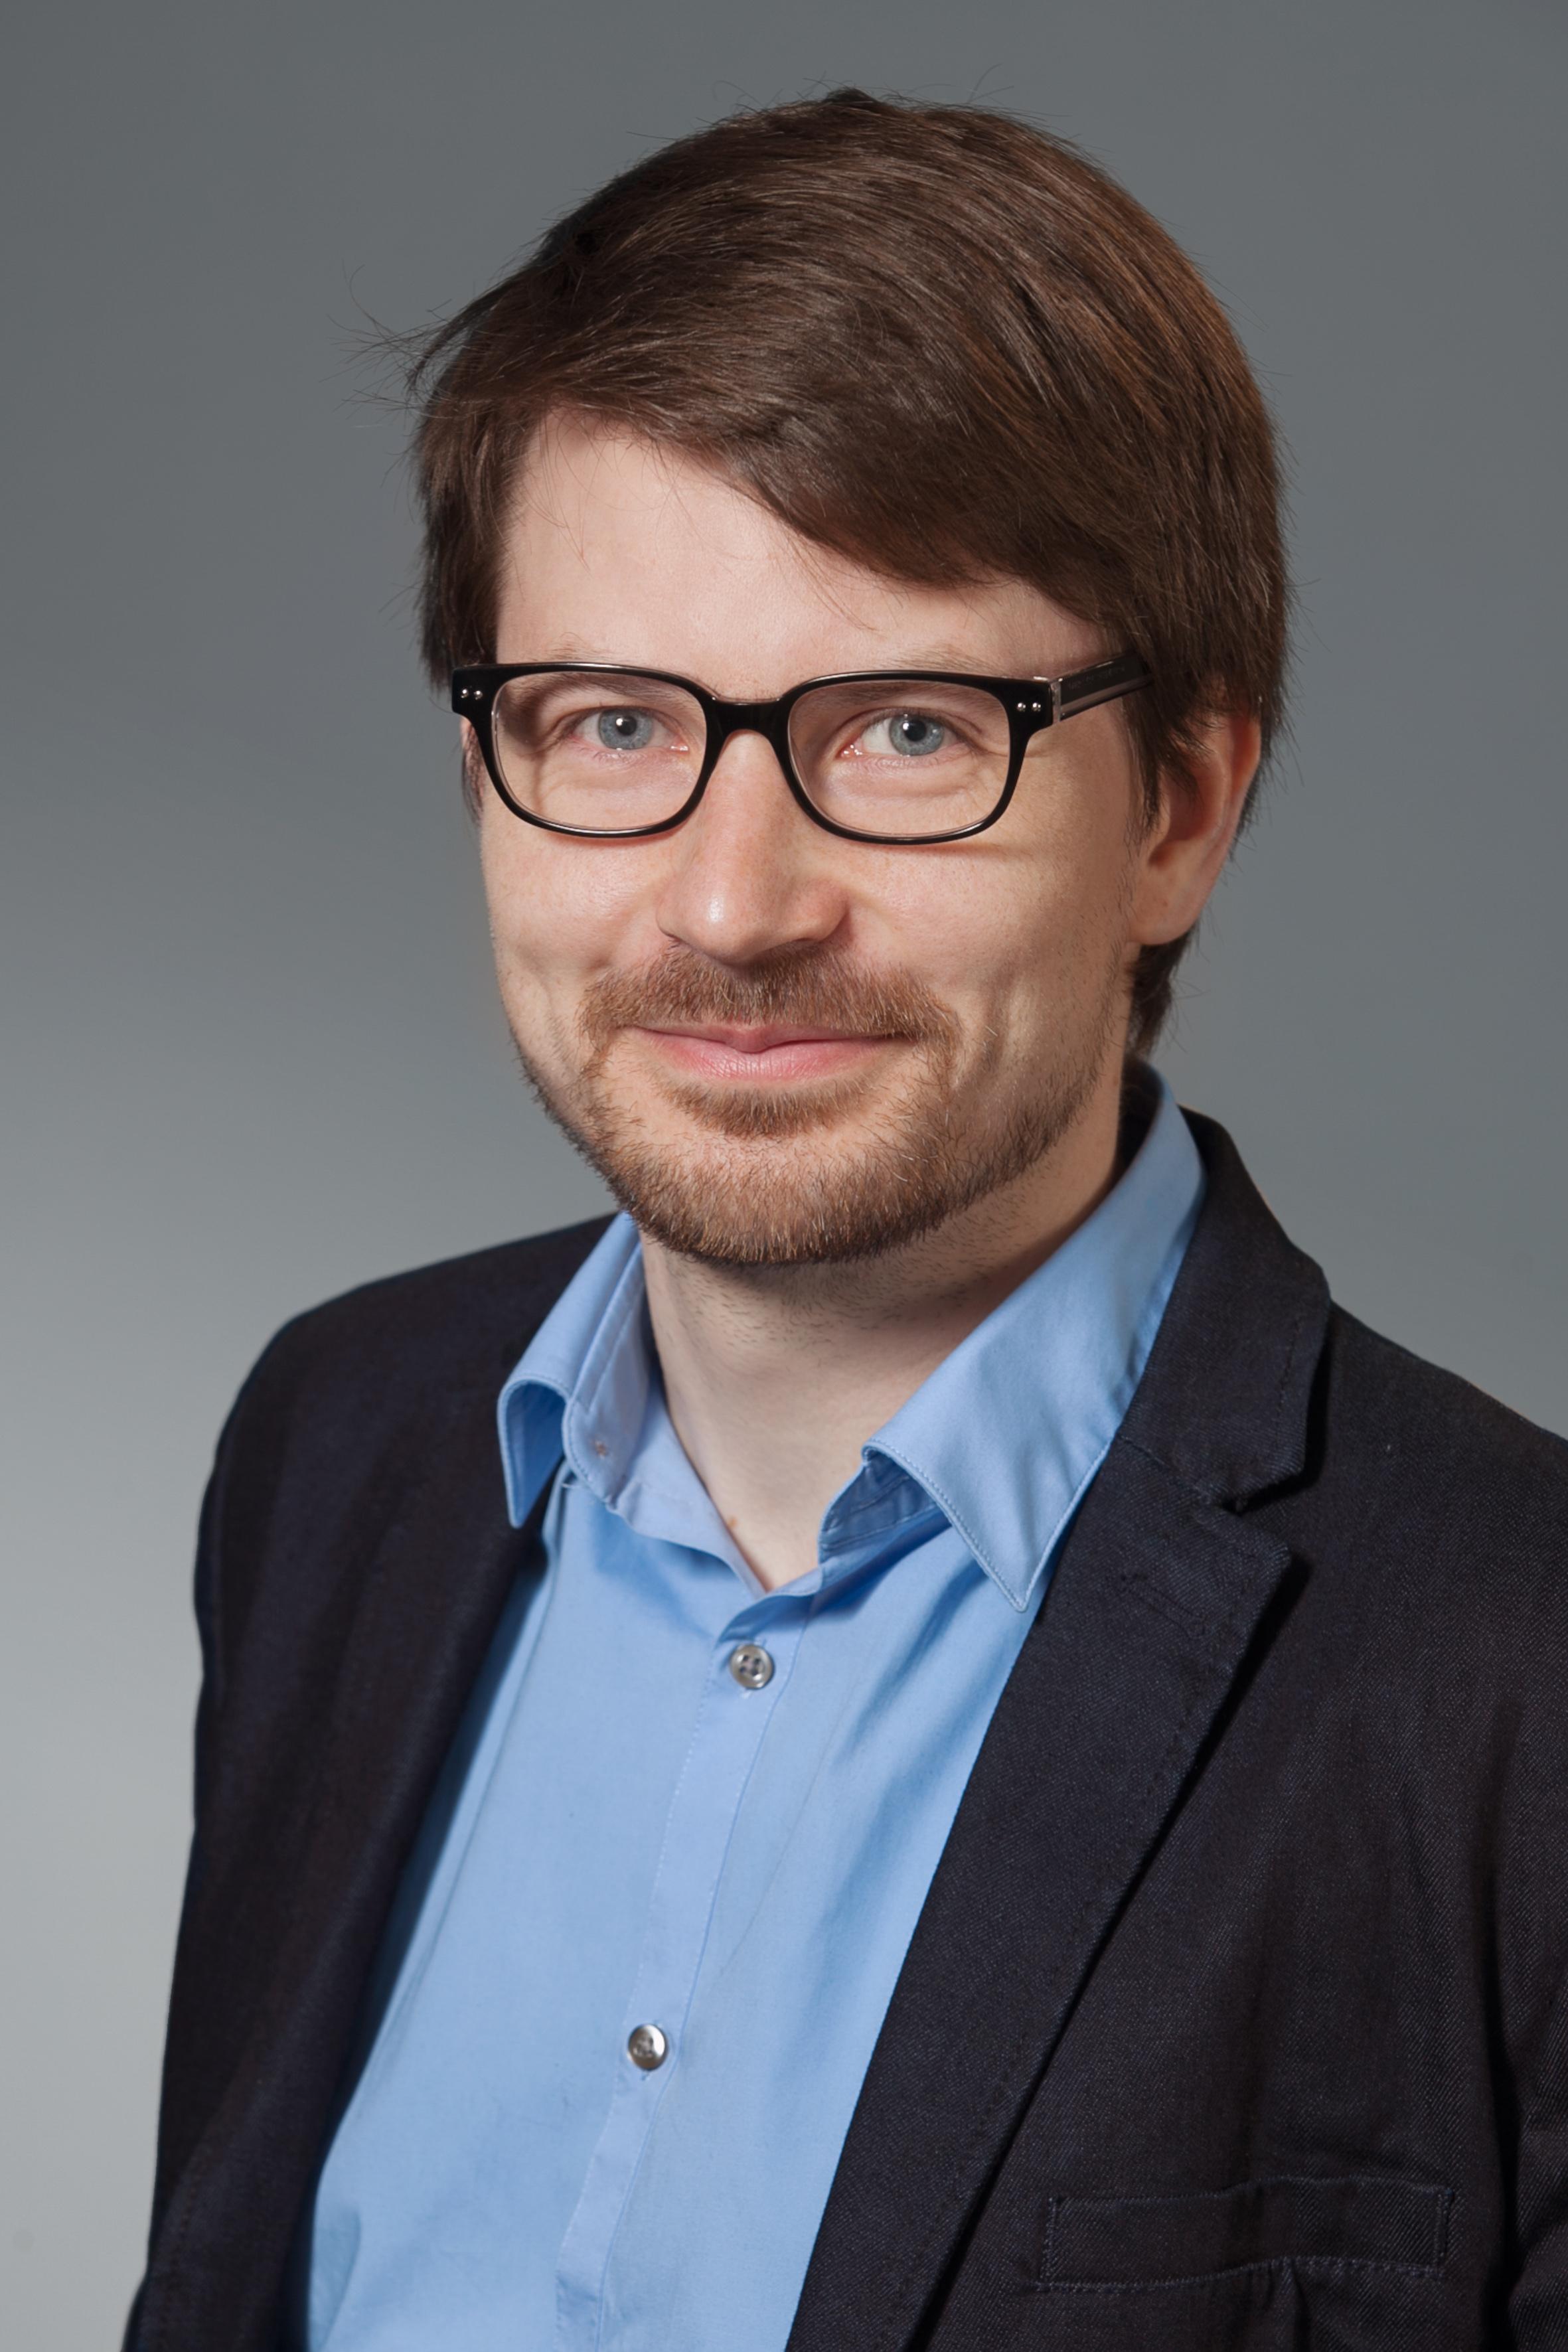 Tuomas Iso-Markku